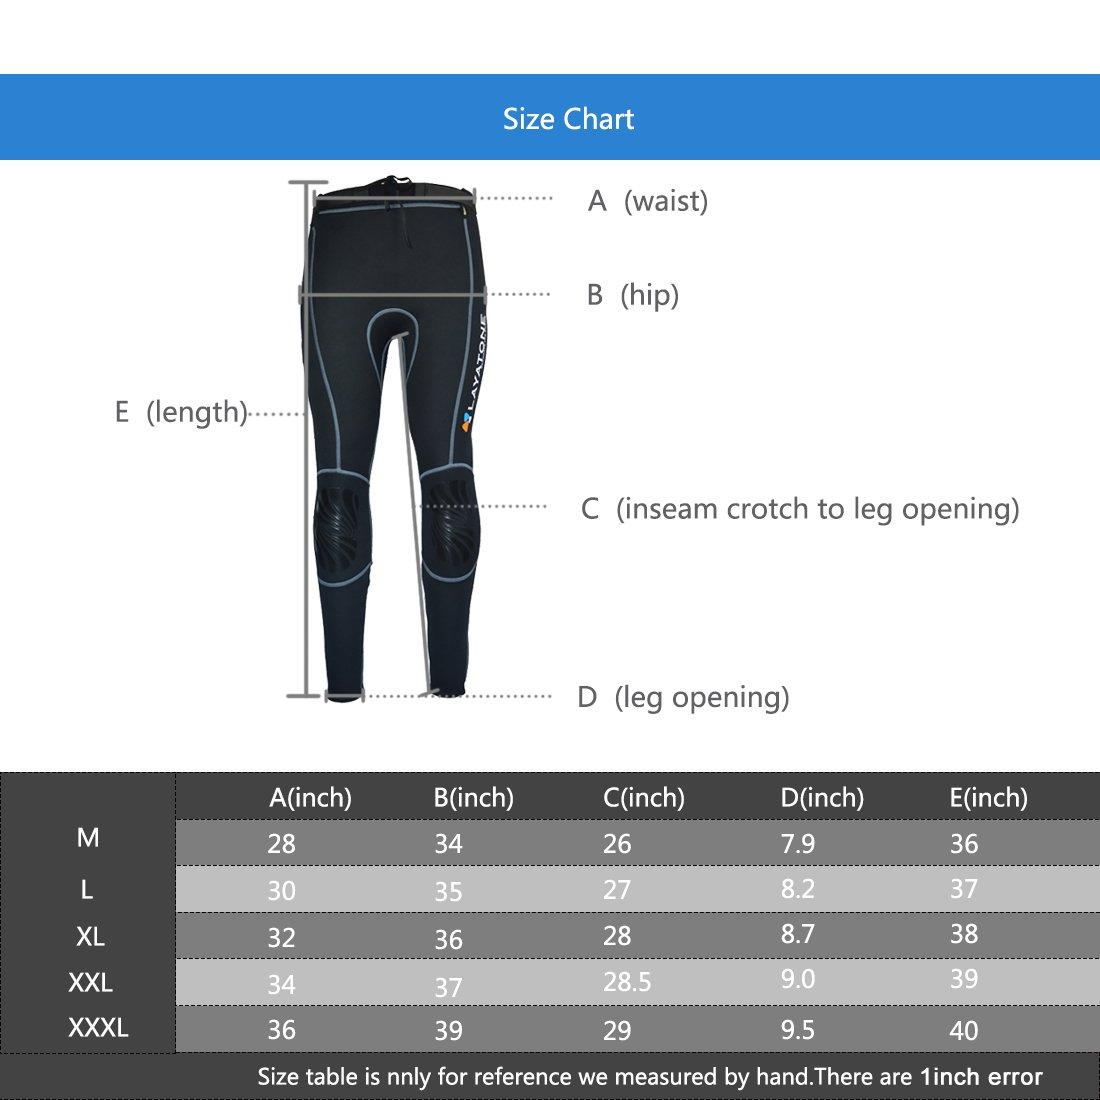 Layatone Wetsuit Pants Men Women Premium 3mm Neoprene Pants Surfing Snorkeling Canoeing Swimming Spearfishing Suit Pants Women Men Adults UV Protection Wet Suits Men Women by Layatone